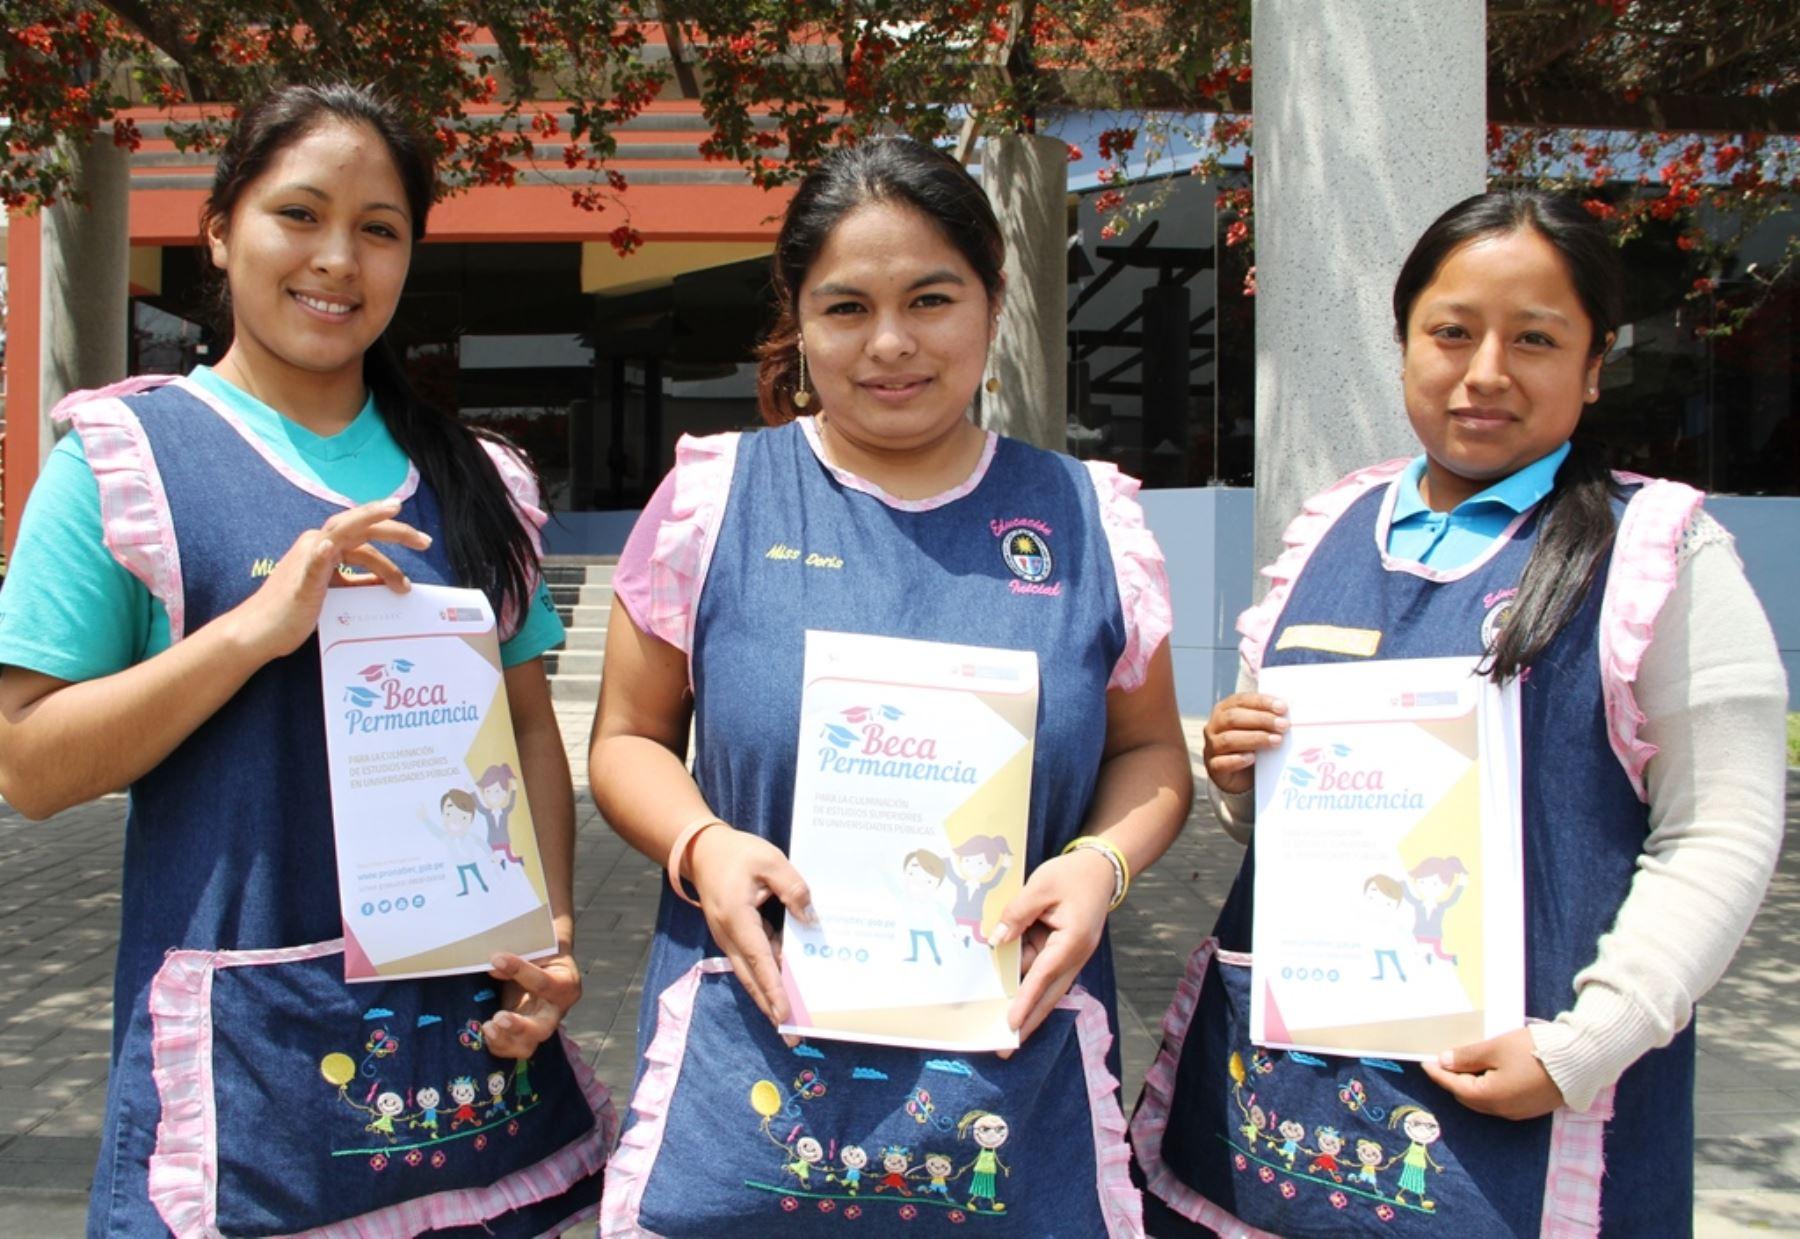 Beca Permanencia ofrece 2,000 becas para culminar estudios en universidades públicas. Foto: ANDINA/Difusión.